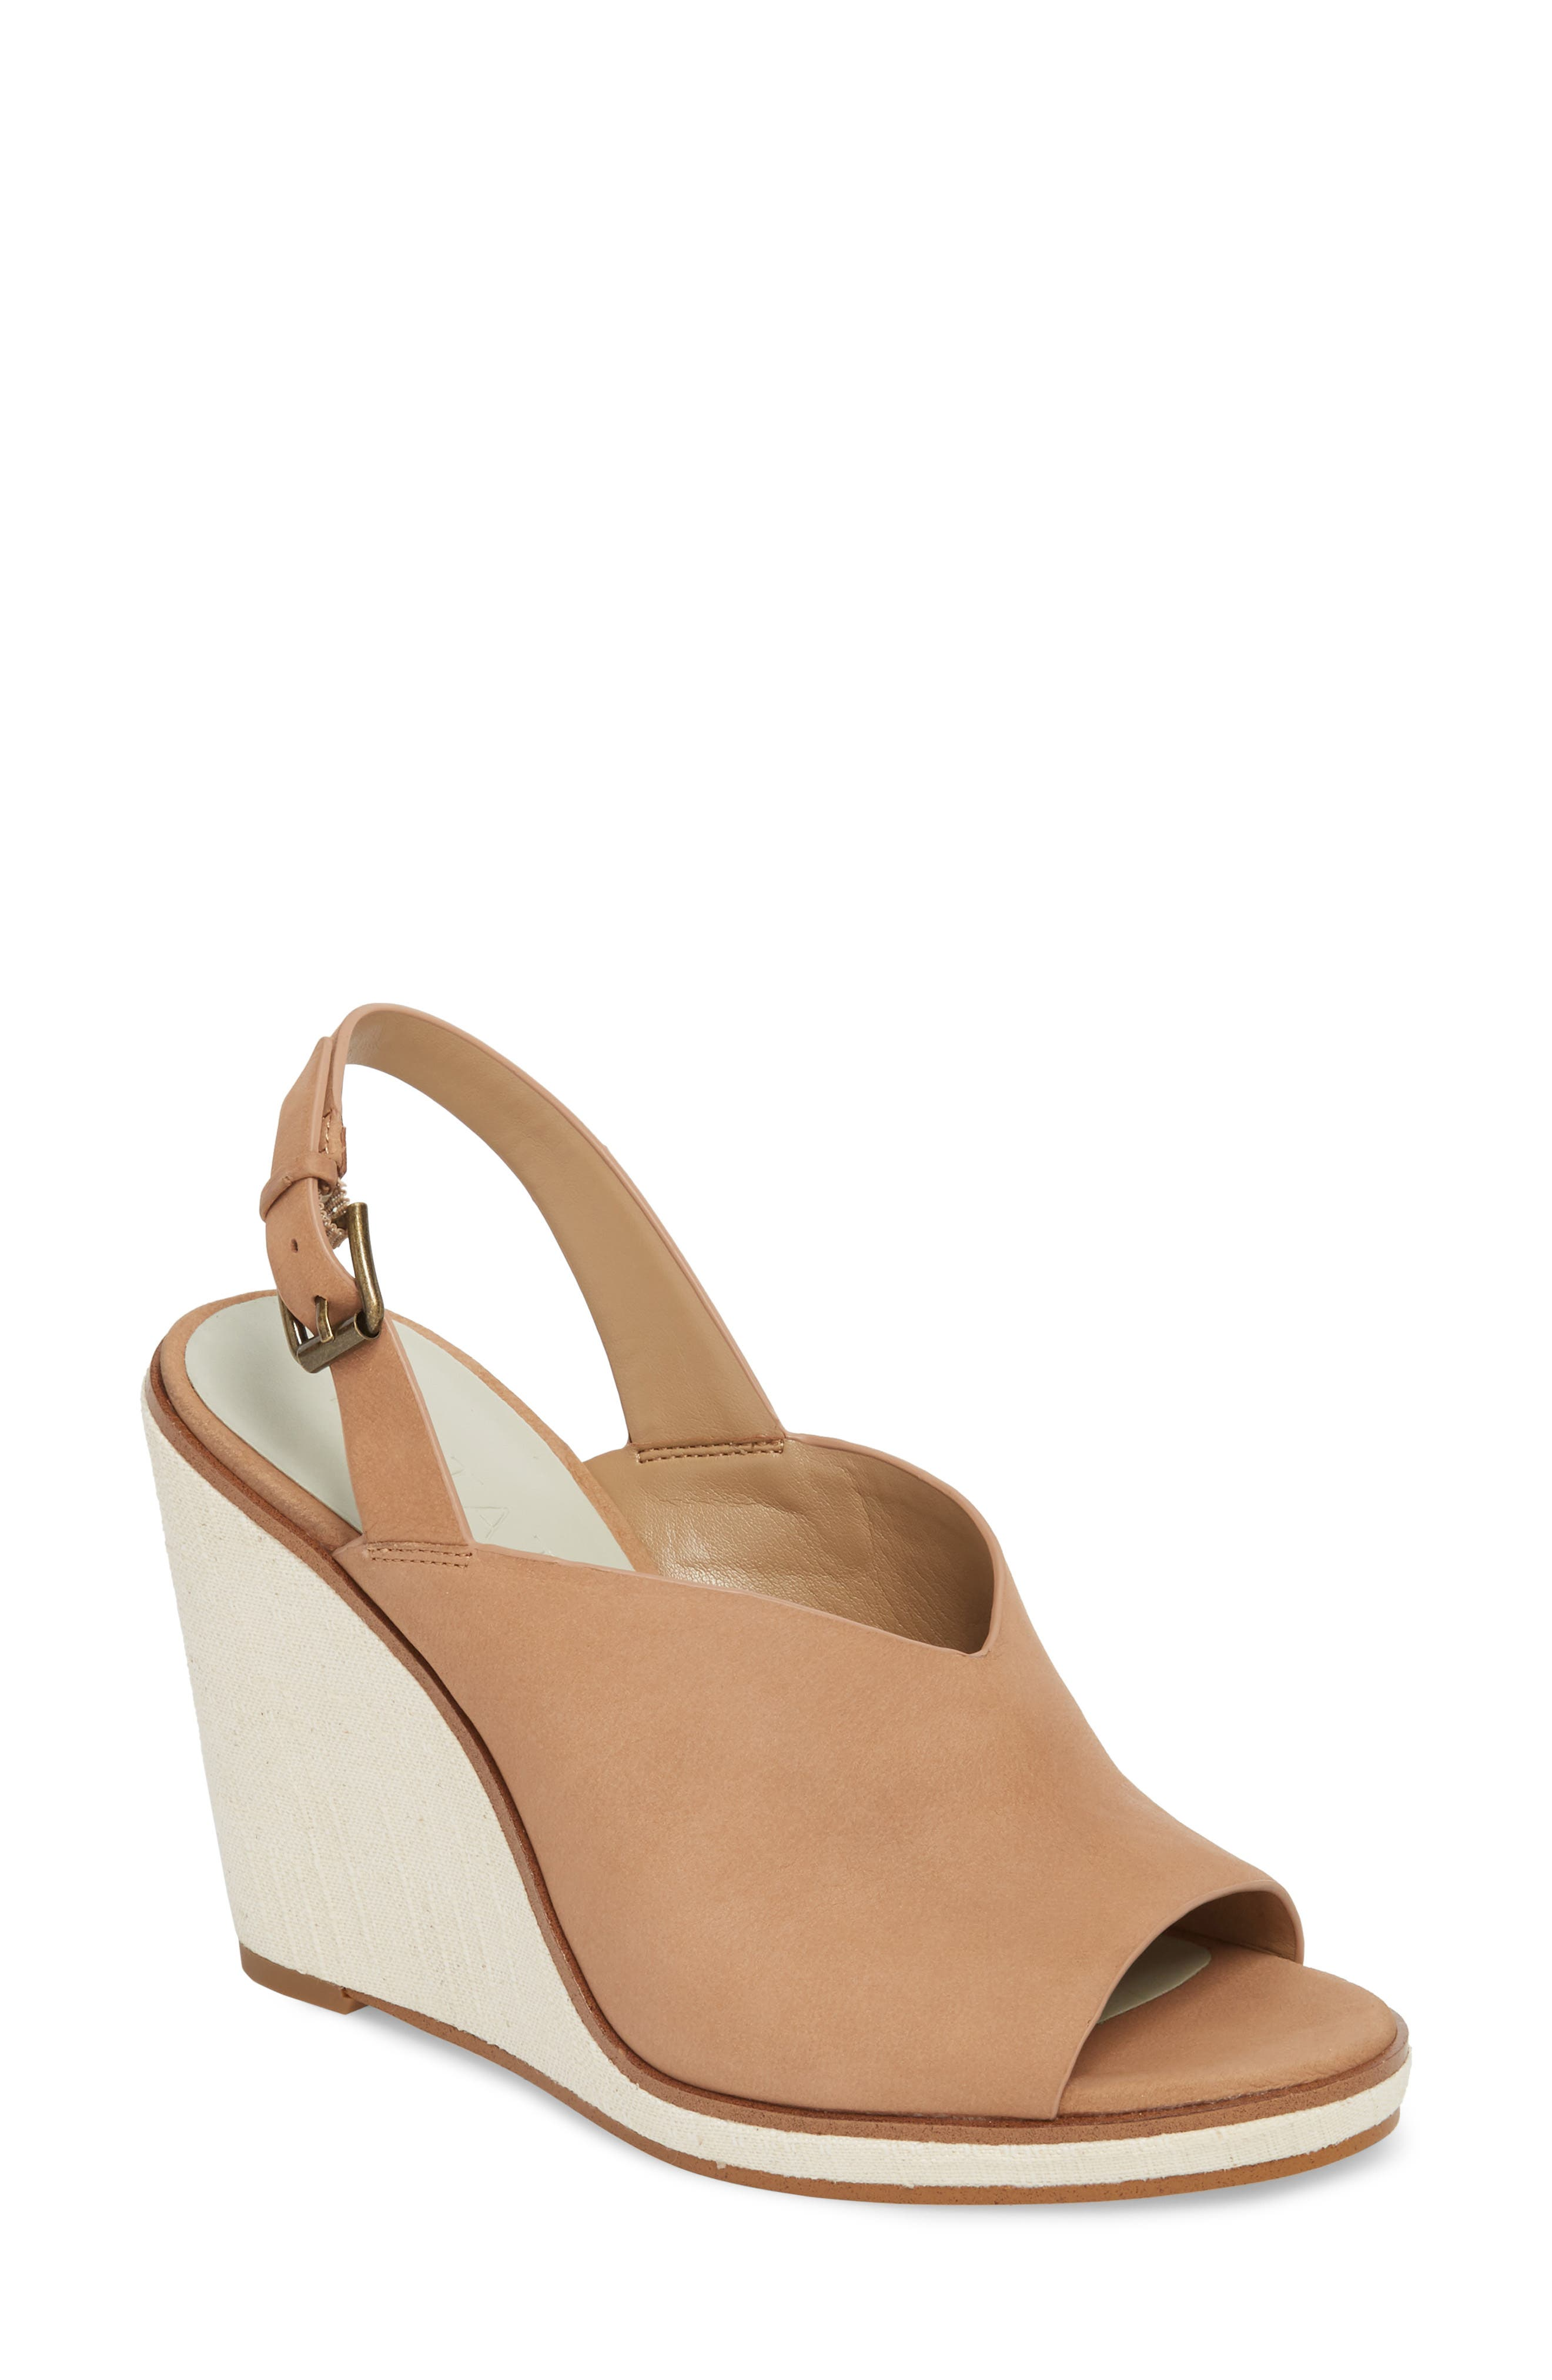 1.STATE Genna Wedge Sandal (Women)